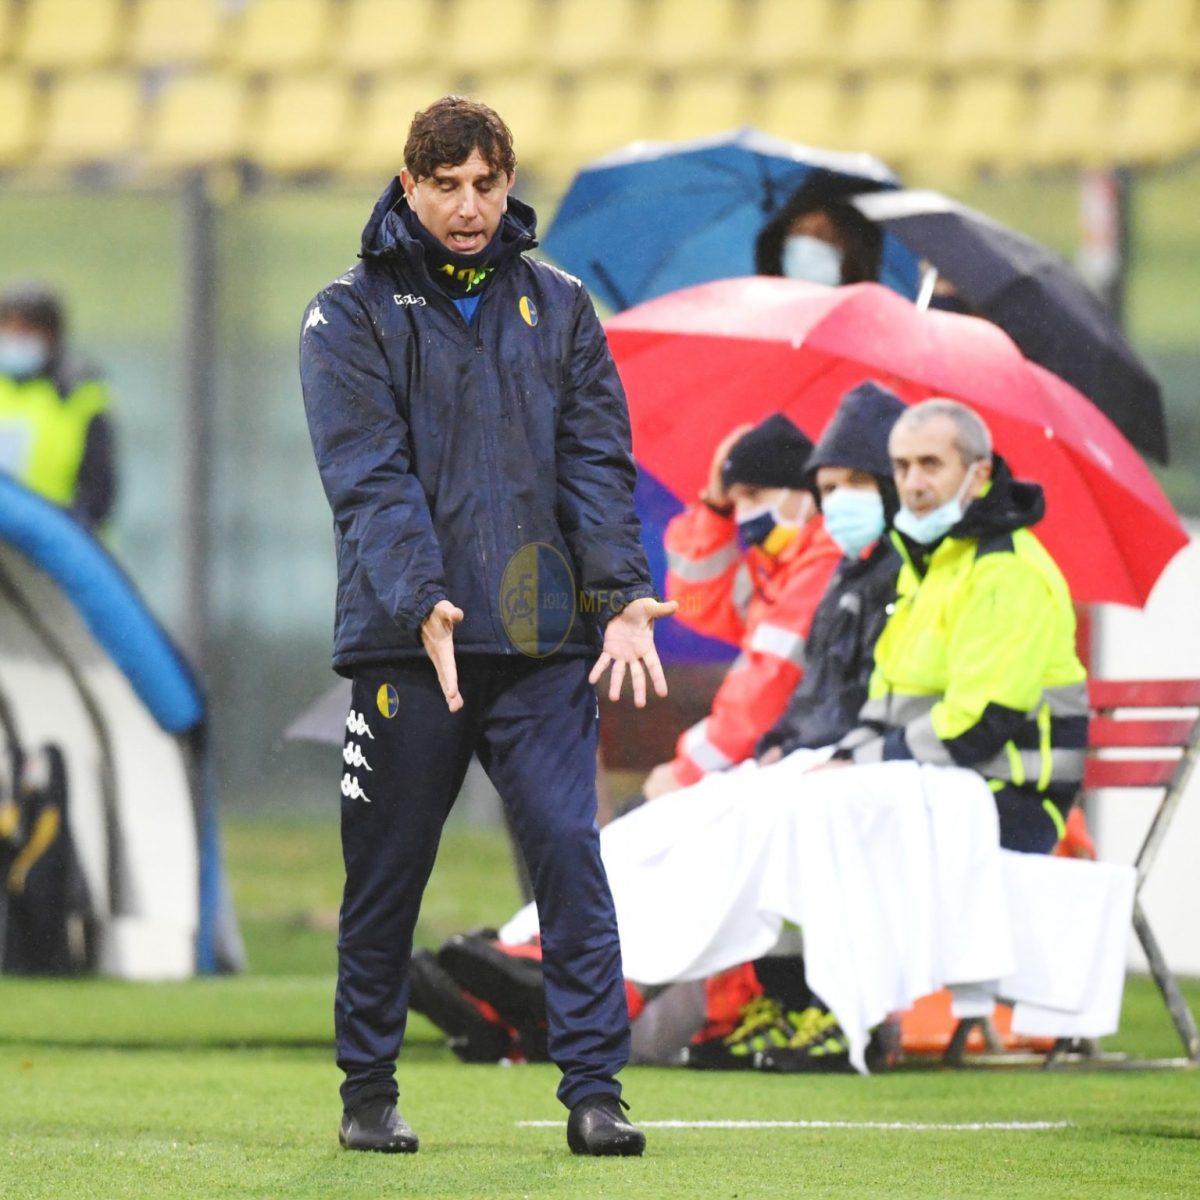 Modena calcio: mr. Mignani e Vergassola aisaluti.